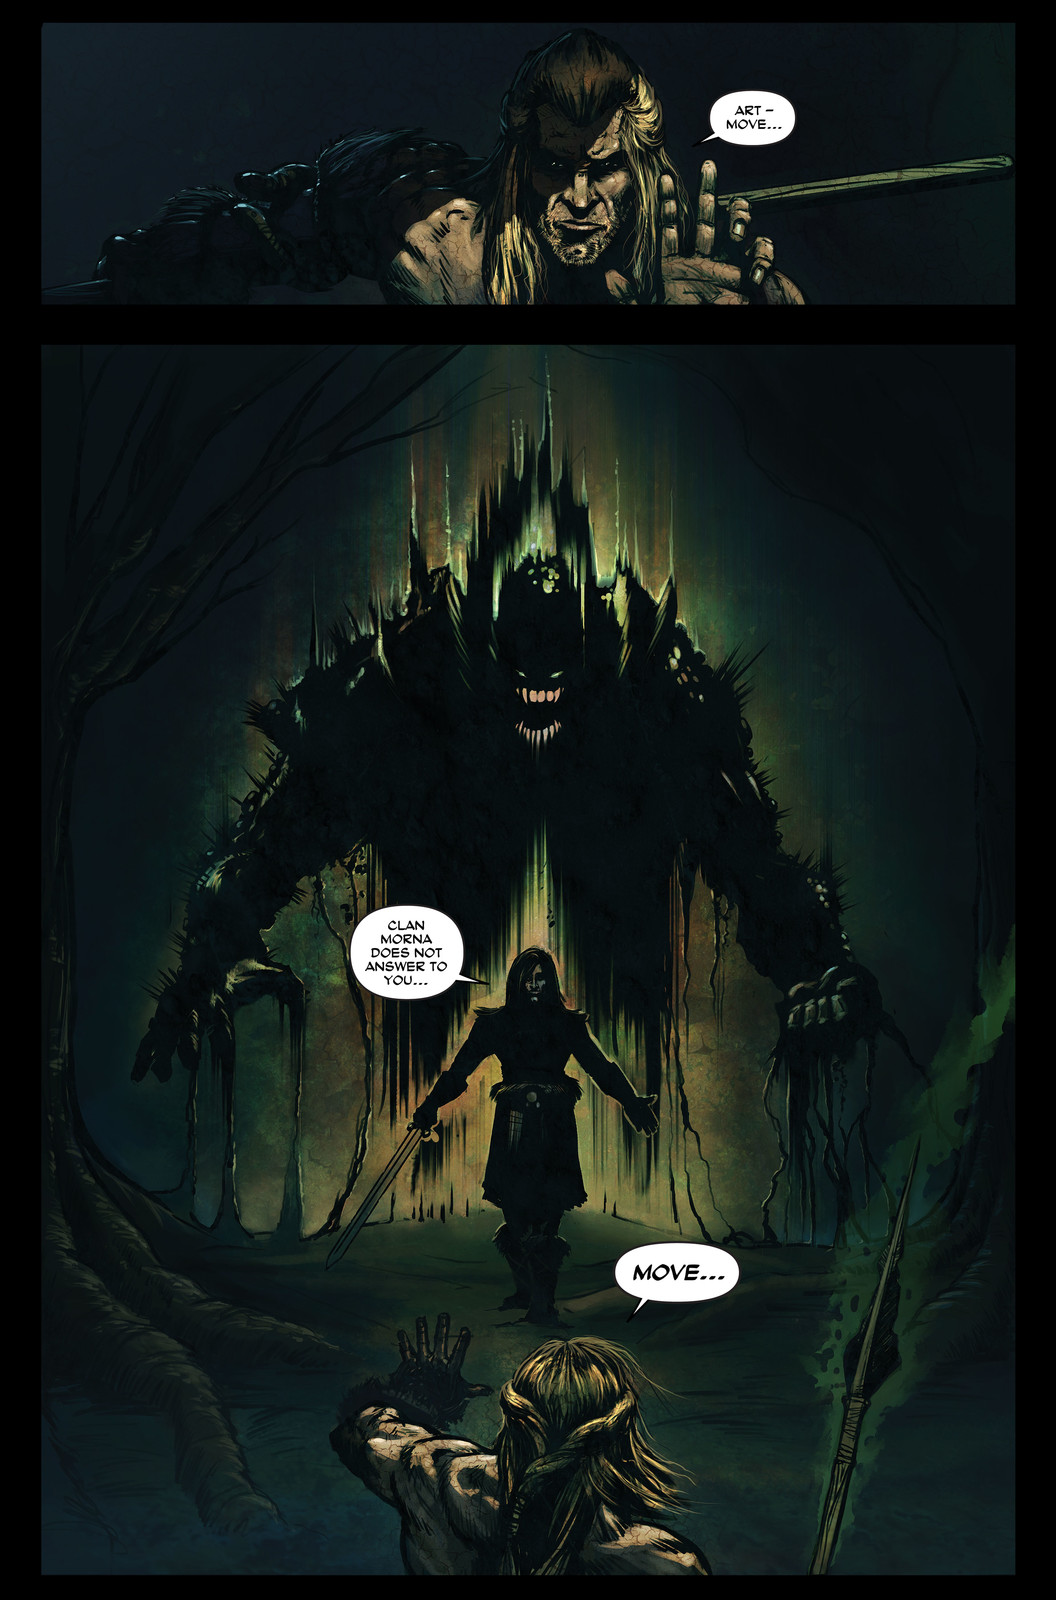 Finn McCool Comic - Finn meets Art and the creature Aillen